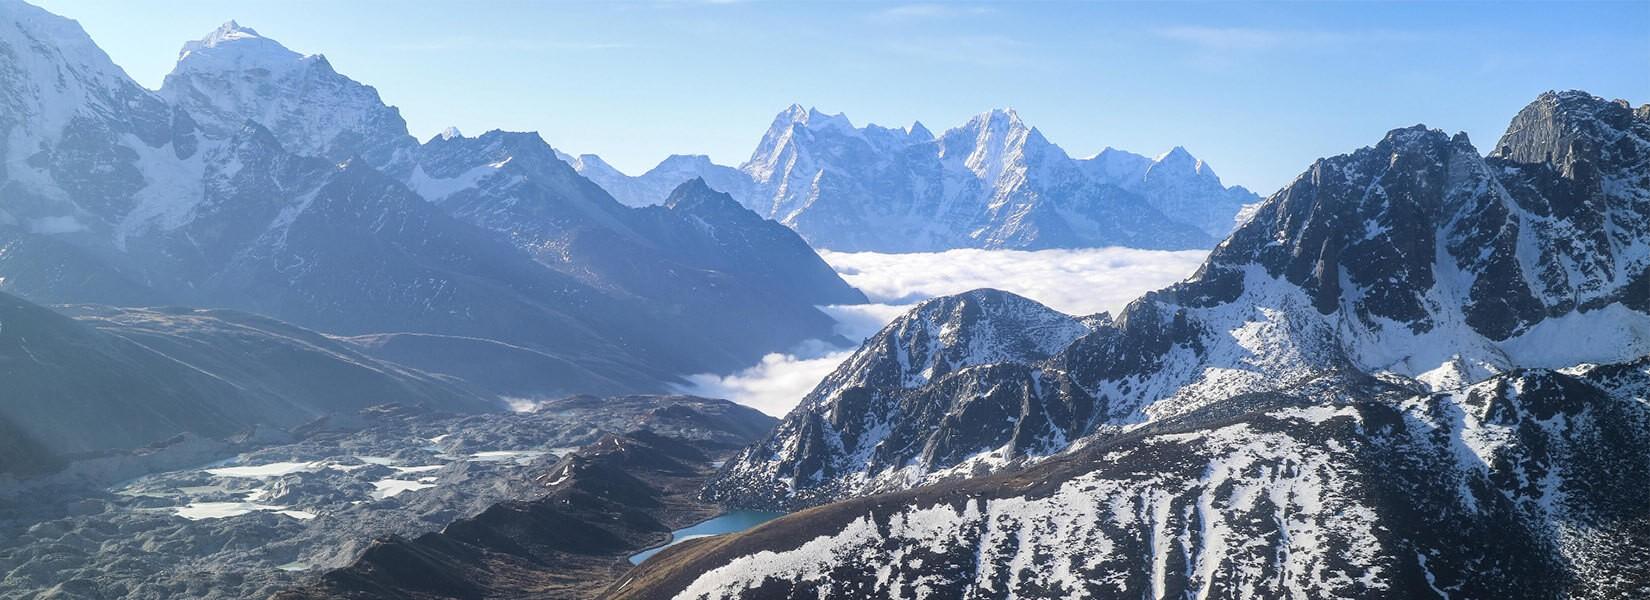 above 6000m peaks nepal